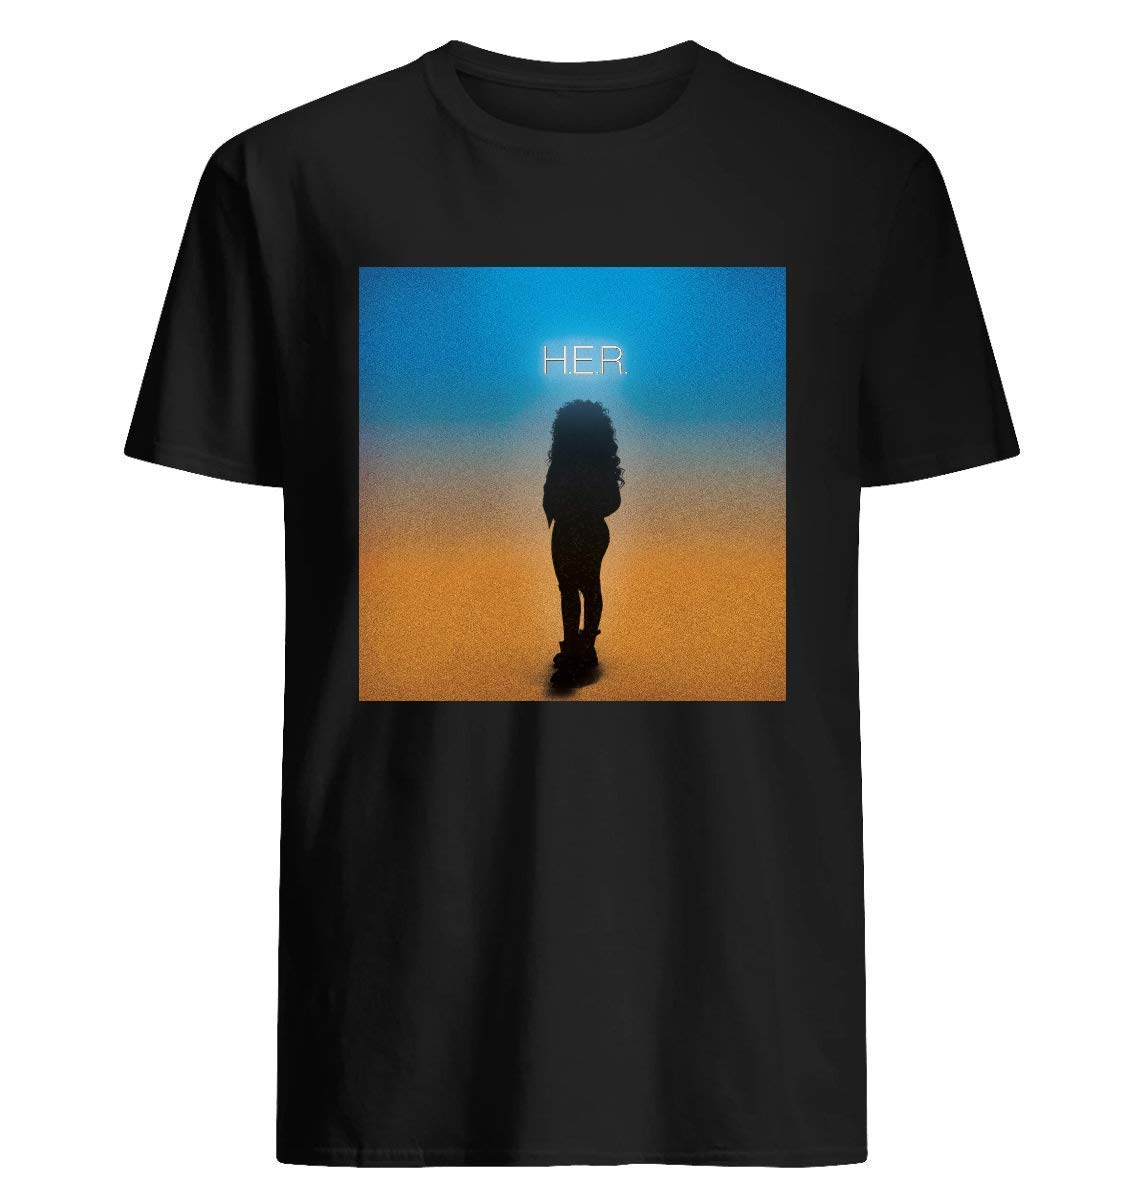 H E R 1 Shirts